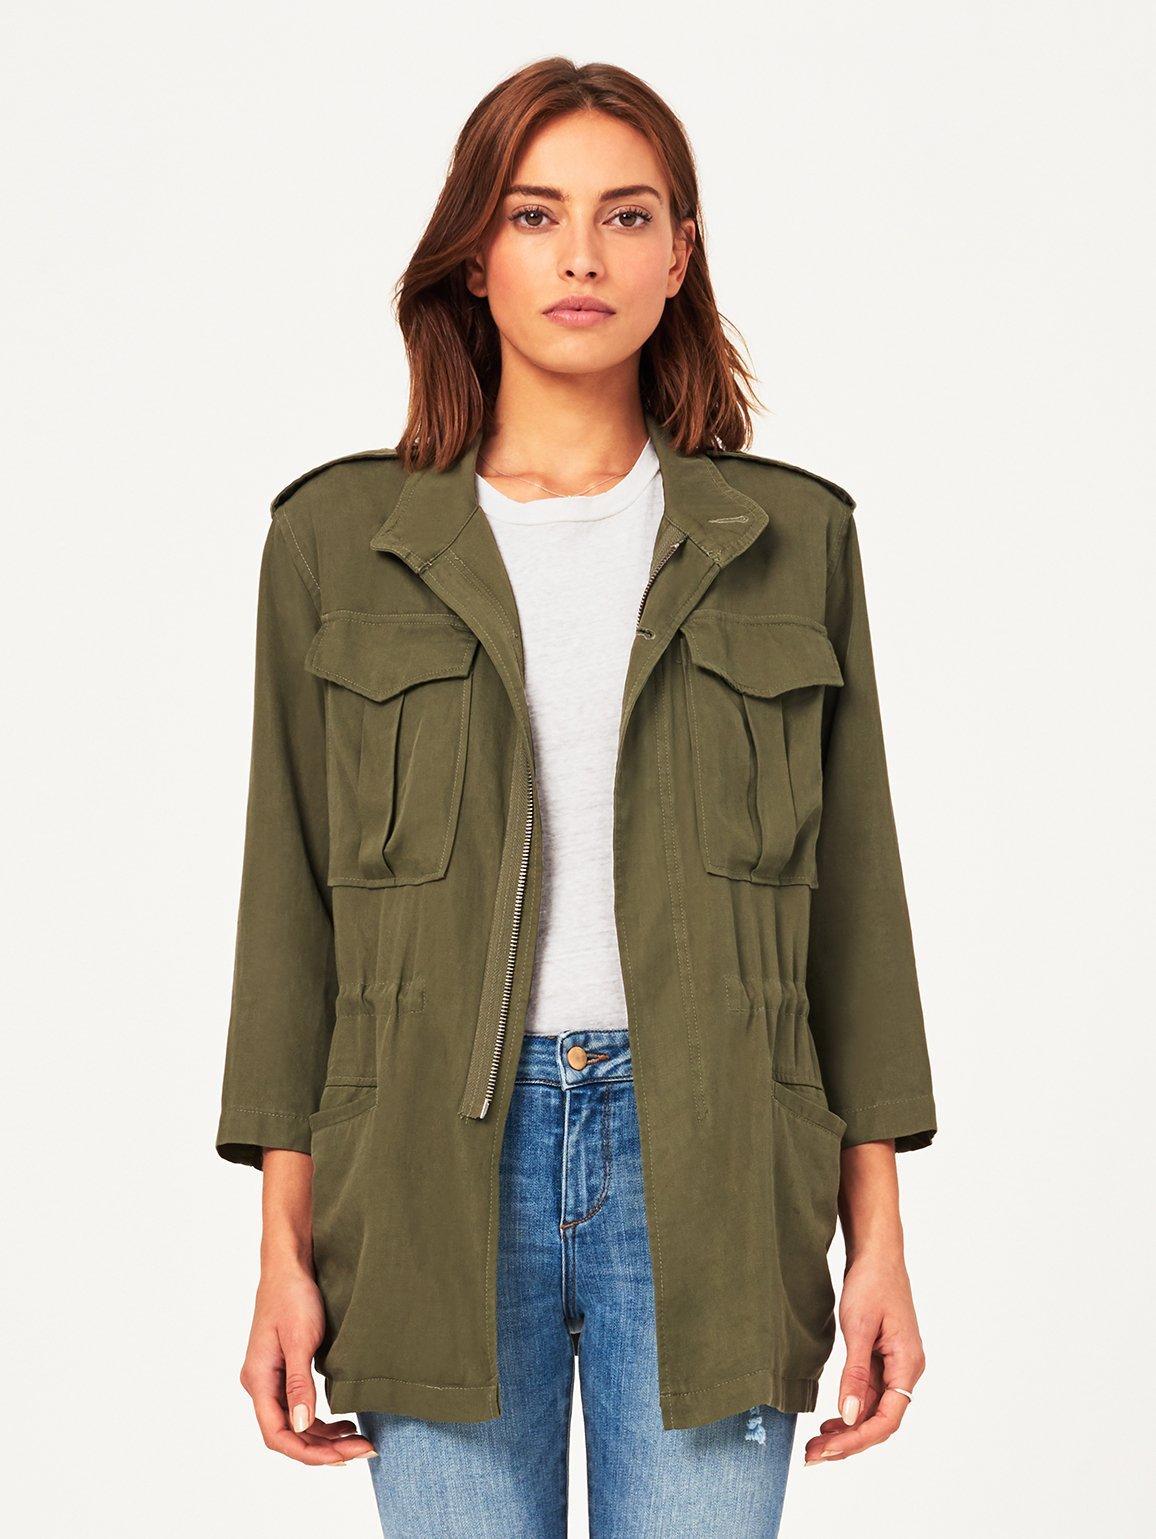 Military Jacke Damen tragen modern